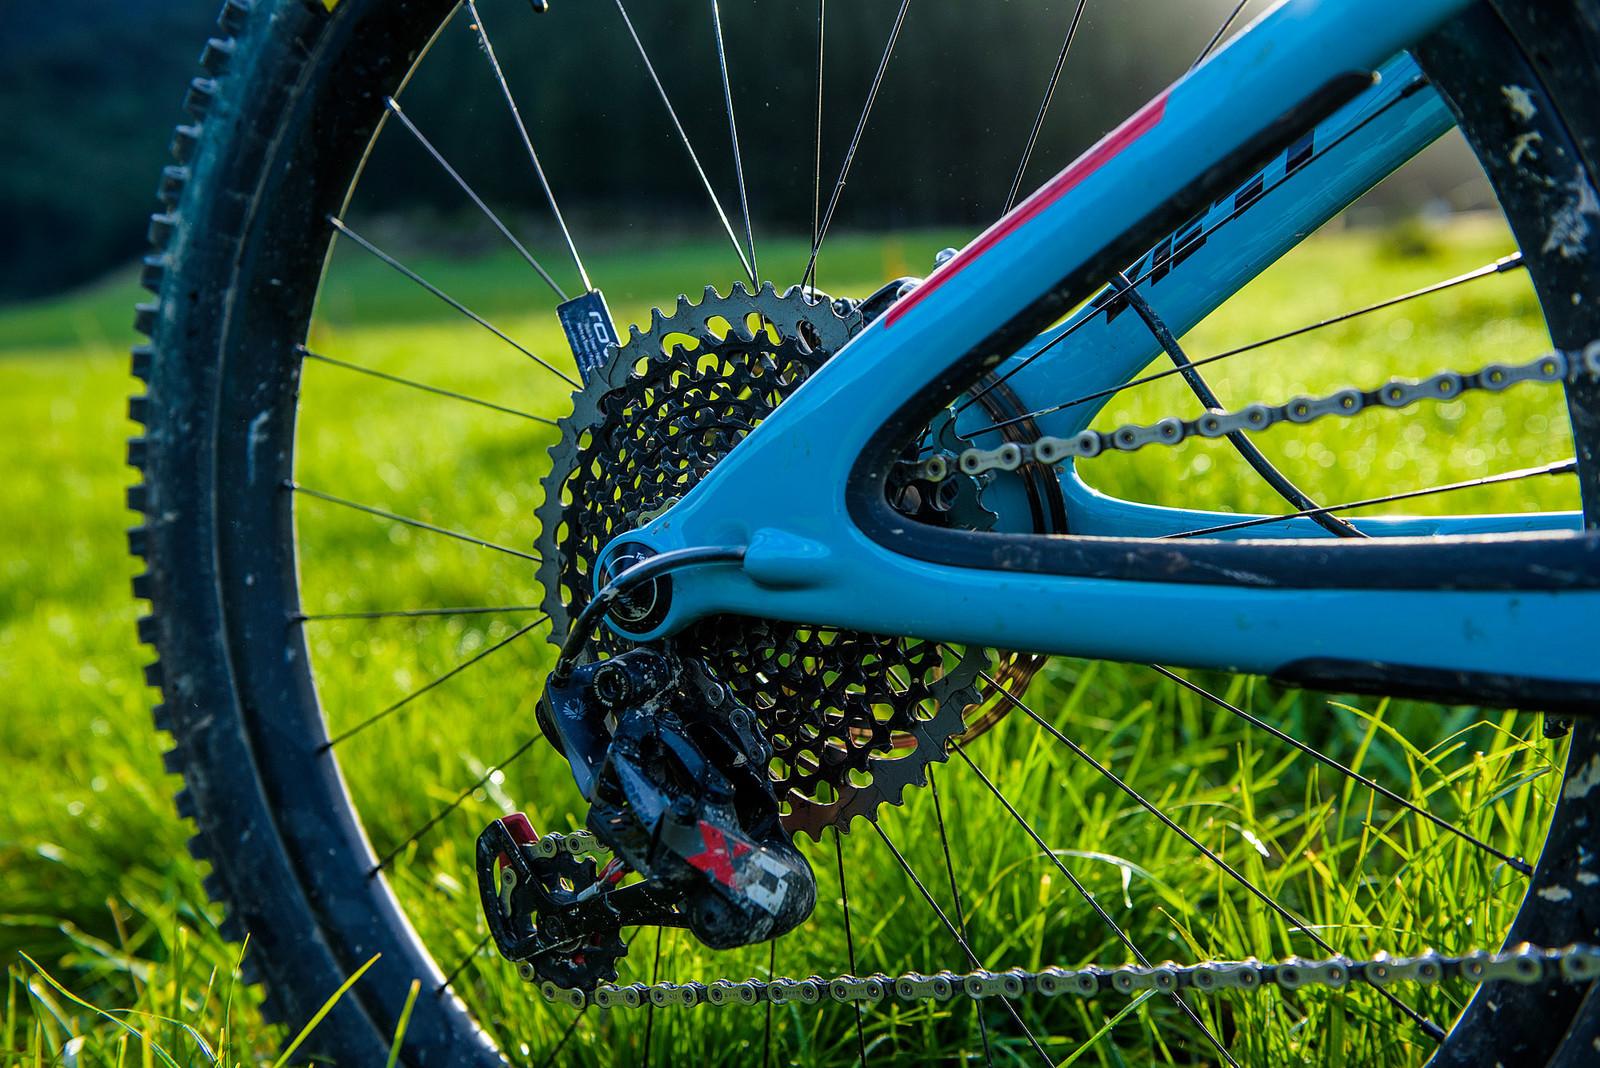 SRAM Eagle X01 Drivetrain - Nate Hills' Yeti SB5 with 2019 RockShox Lyrik - Mountain Biking Pictures - Vital MTB